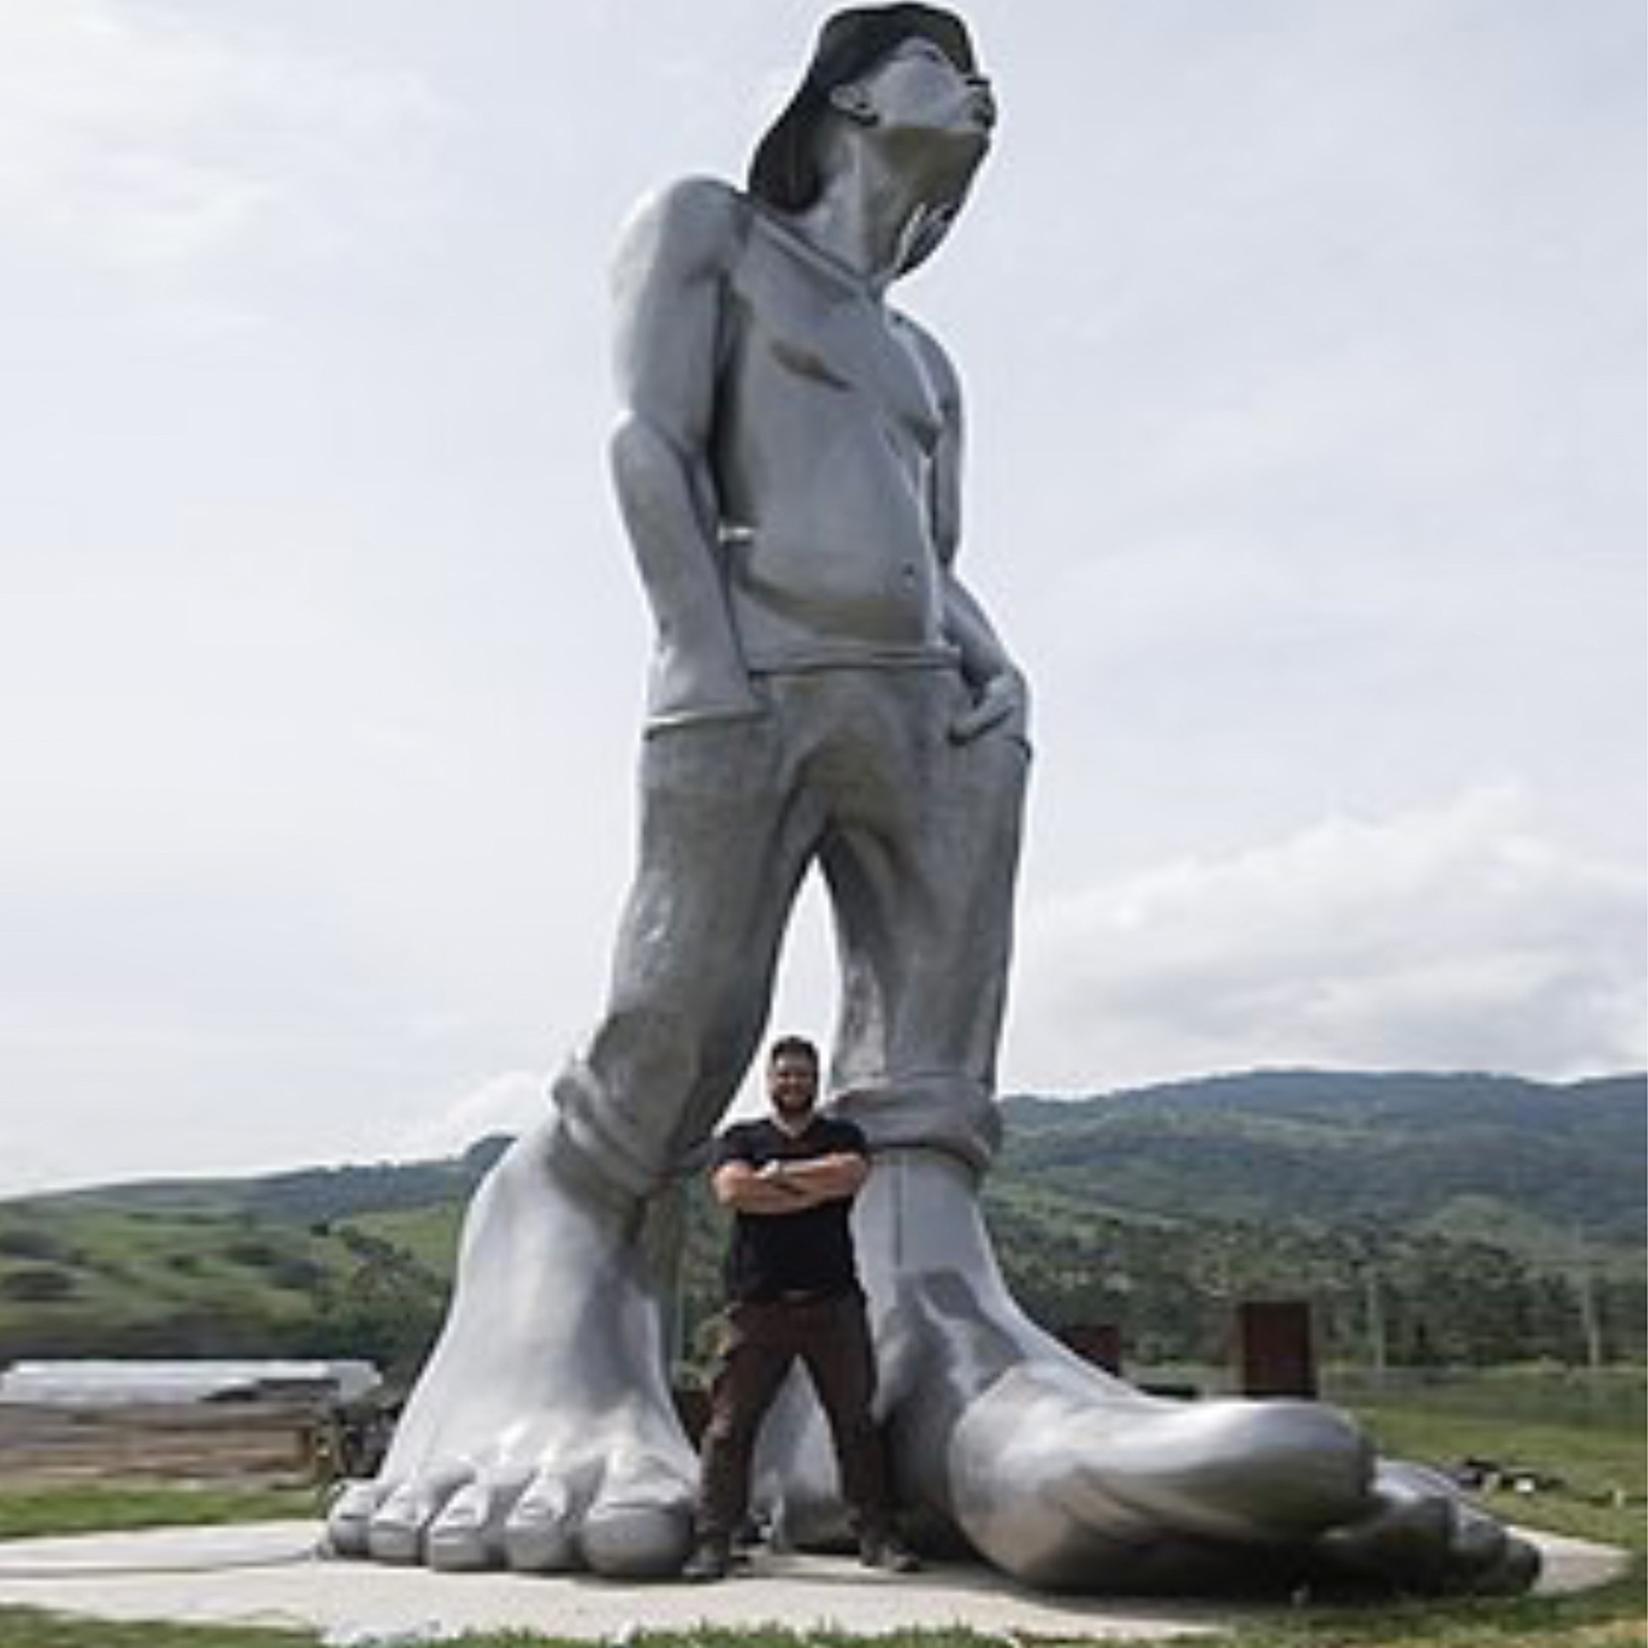 Zareski Siffleur sculpture monumentale